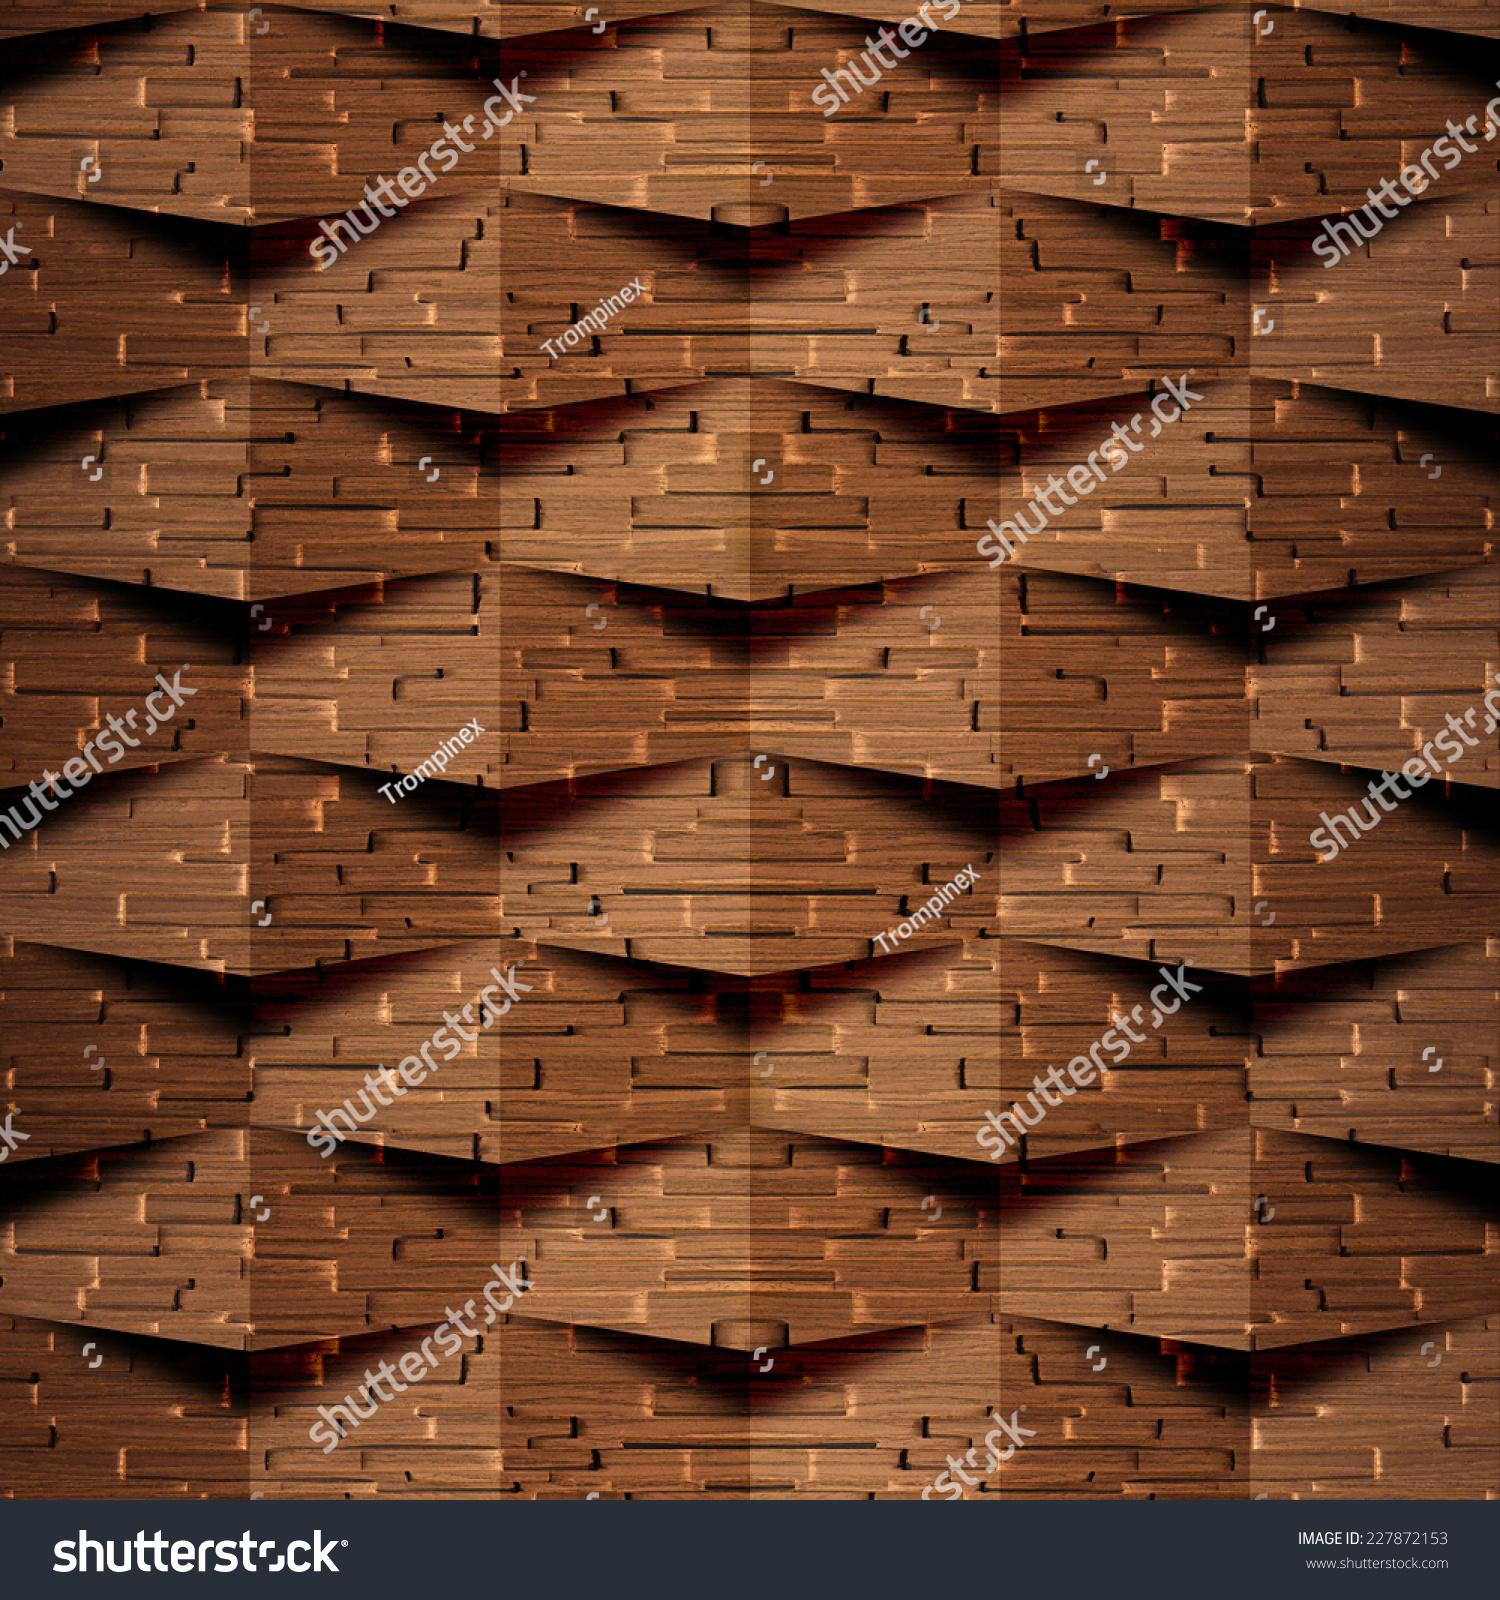 Wood Interior Wall Textures : Background - Wood Wall - Oak Veneer - Decorative Textures - Interior ...